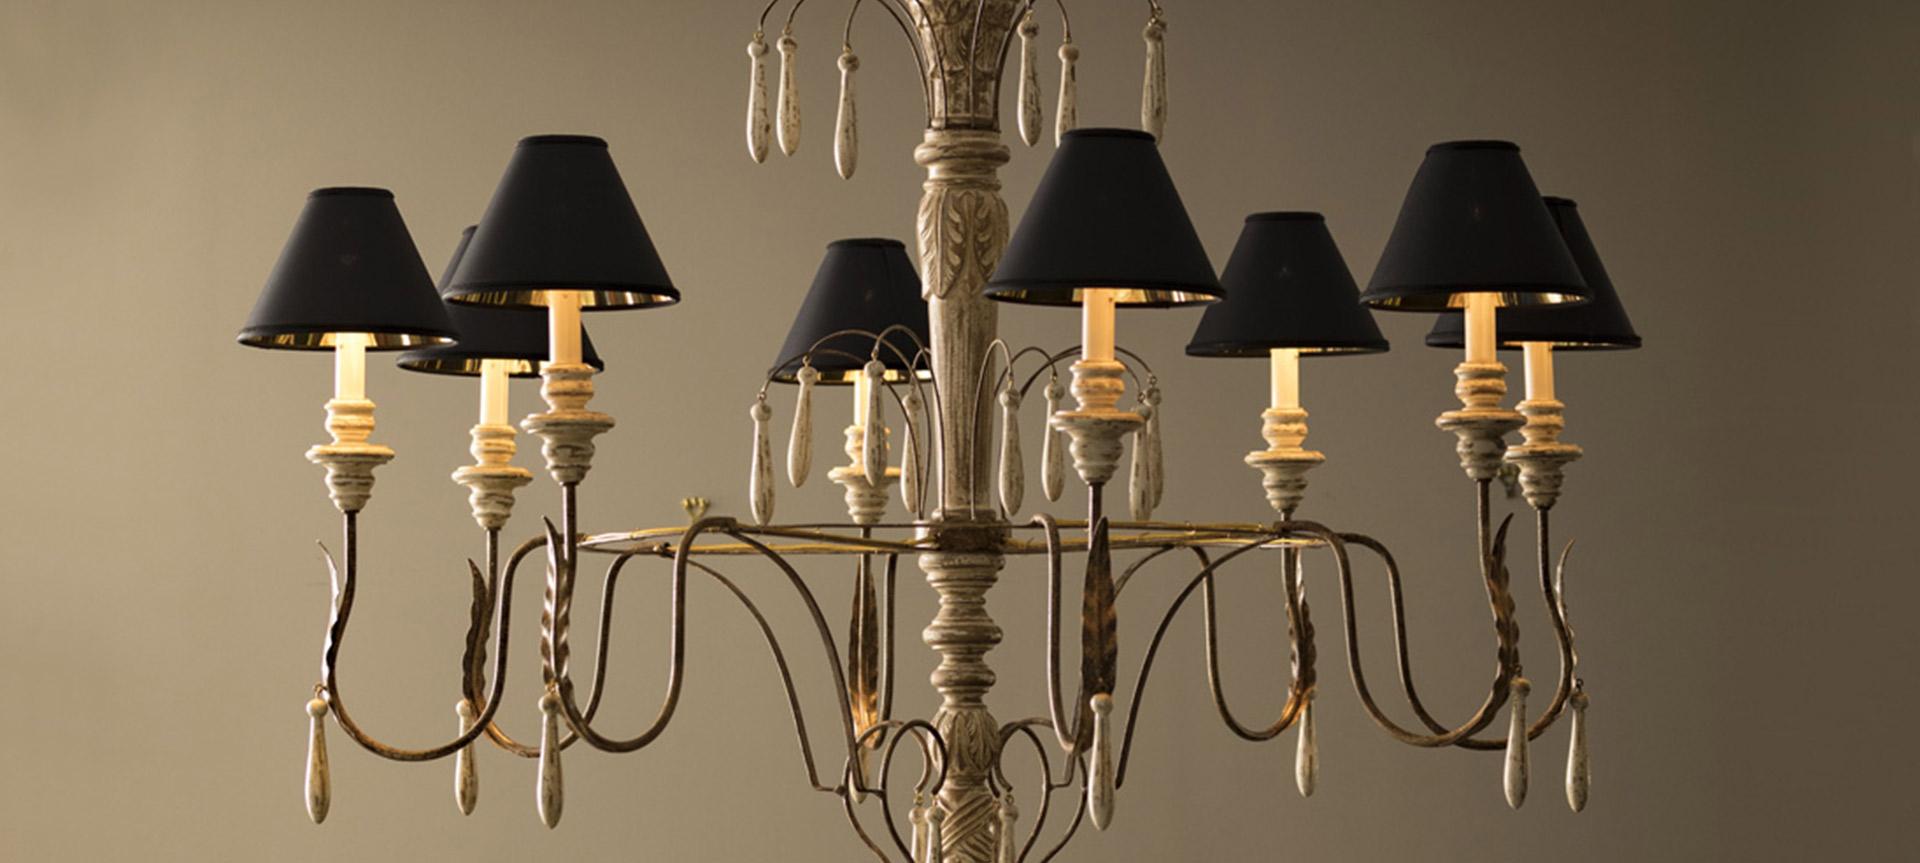 Decorative Crafts Lighting